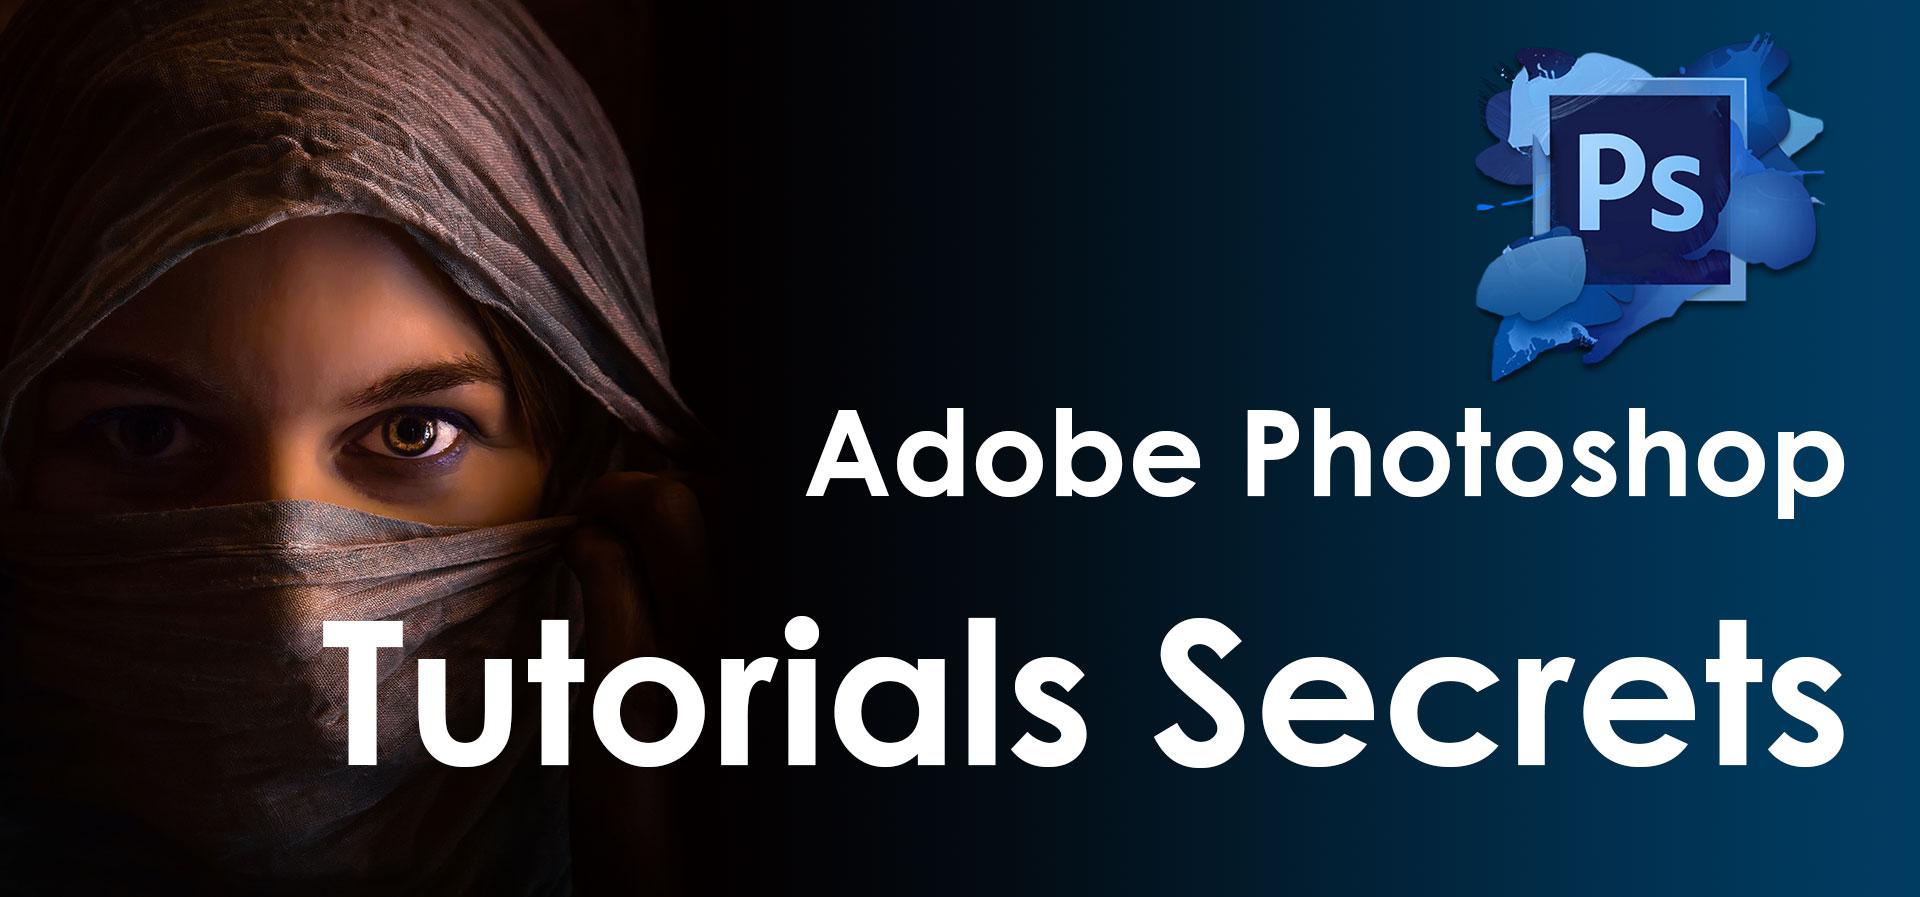 Adobe-Photoshop-Tutorials-Secrets